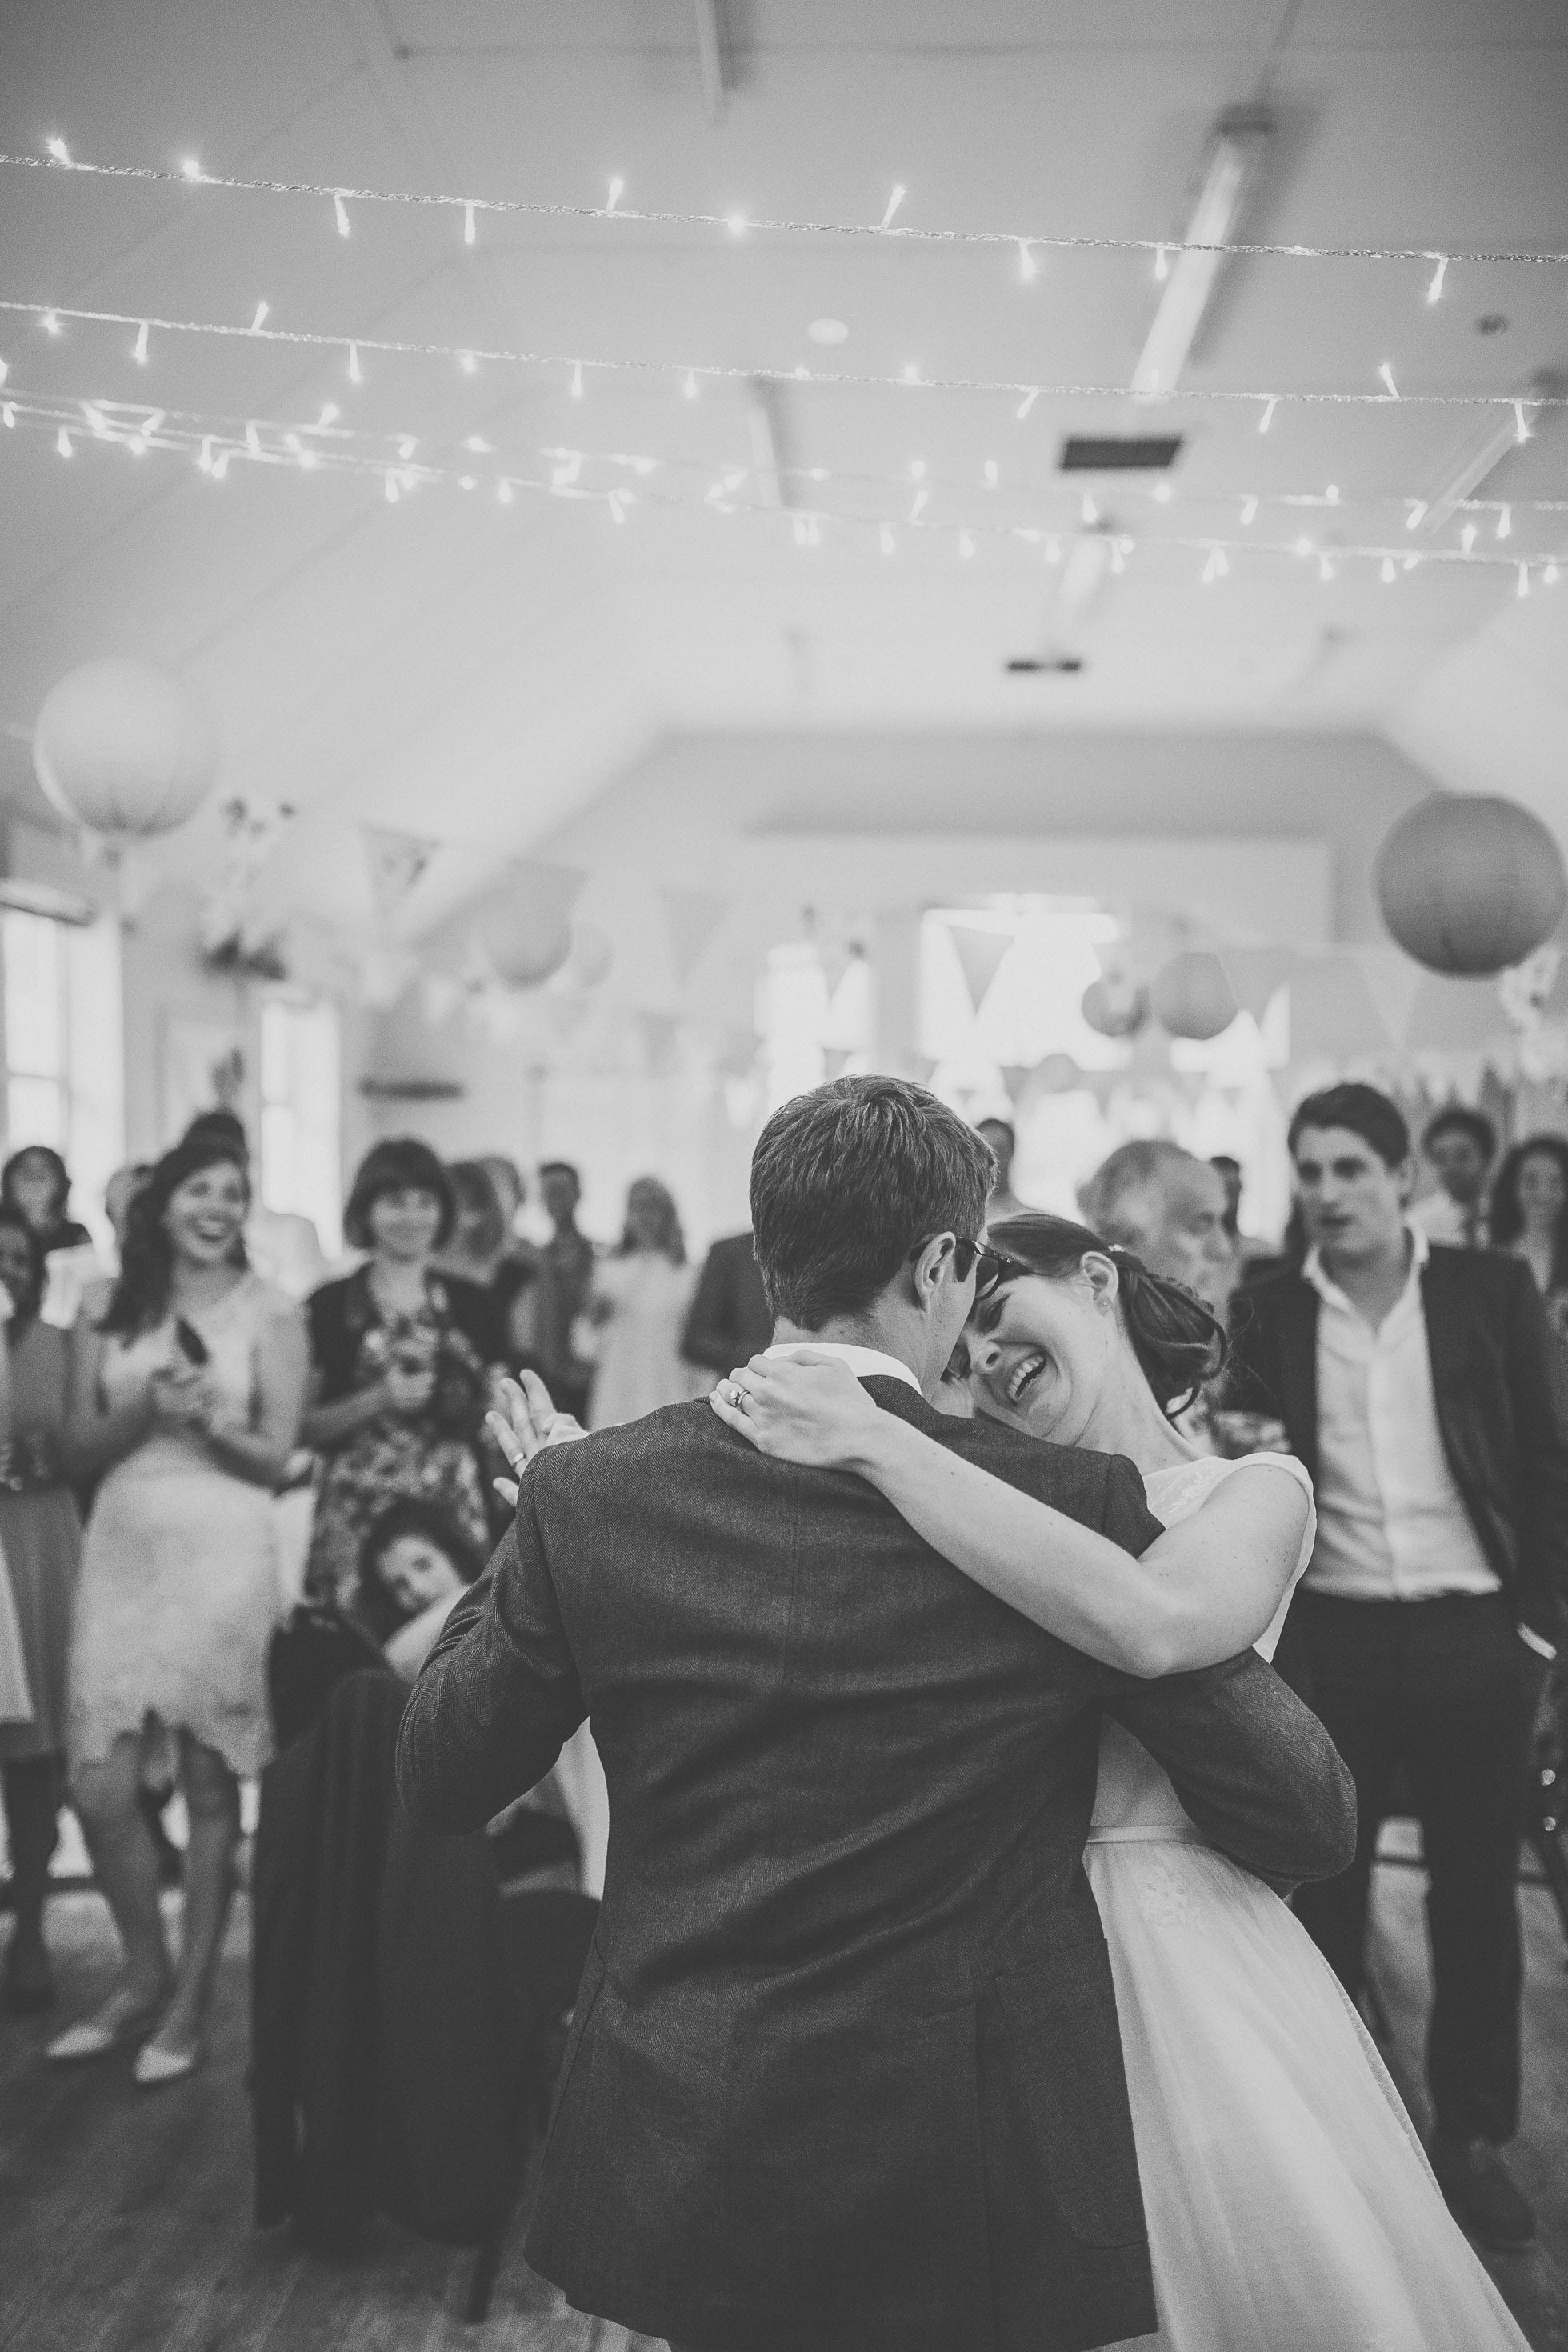 hackness wedding photographer-108.jpg